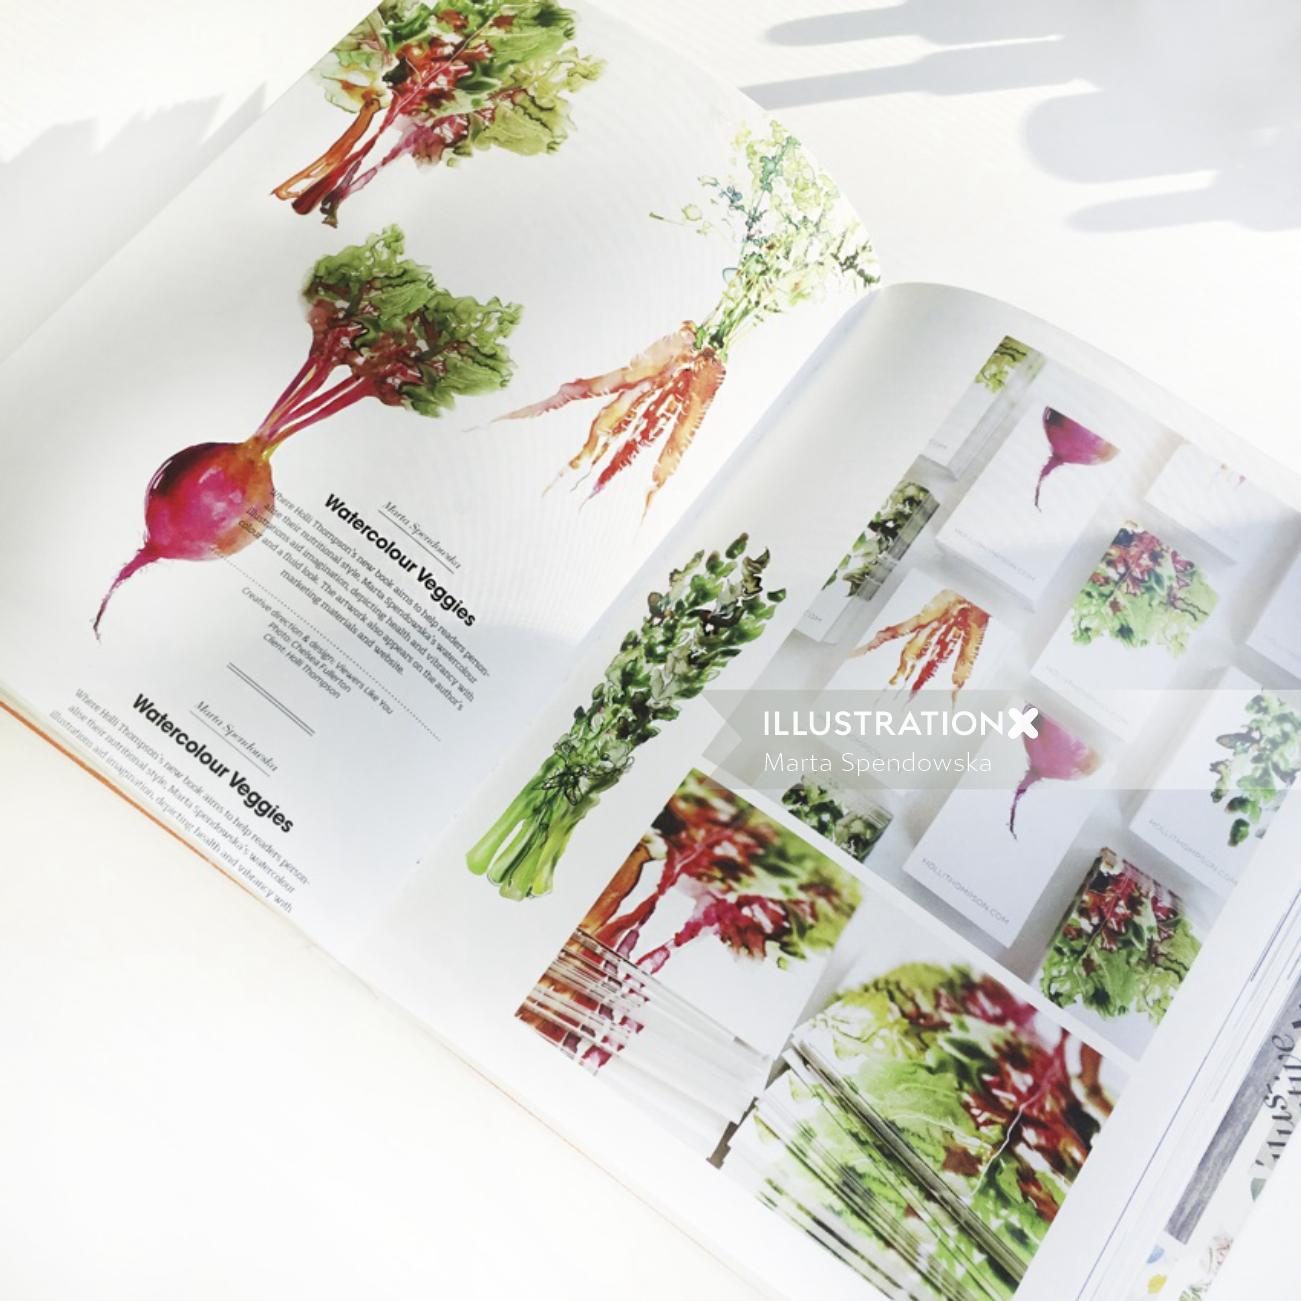 Watercolor veggies by Marta Spendowska